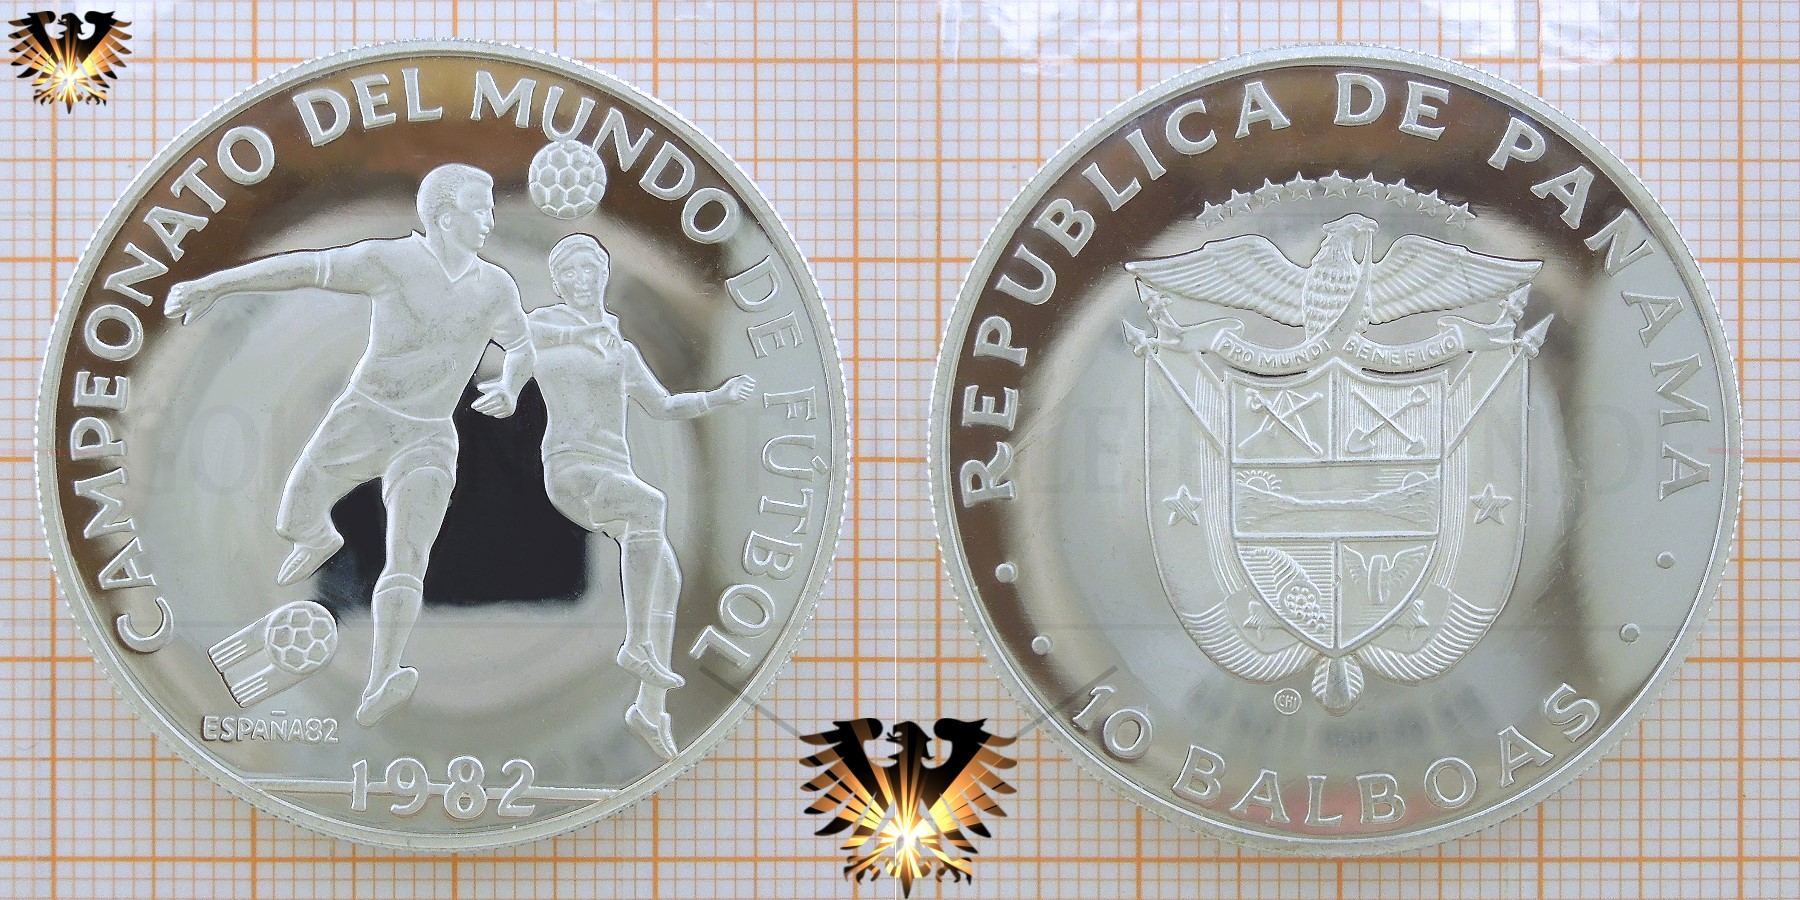 10 Balboas 1982 Panama Zweikampf Campeonato Del Mundo De Fútbol